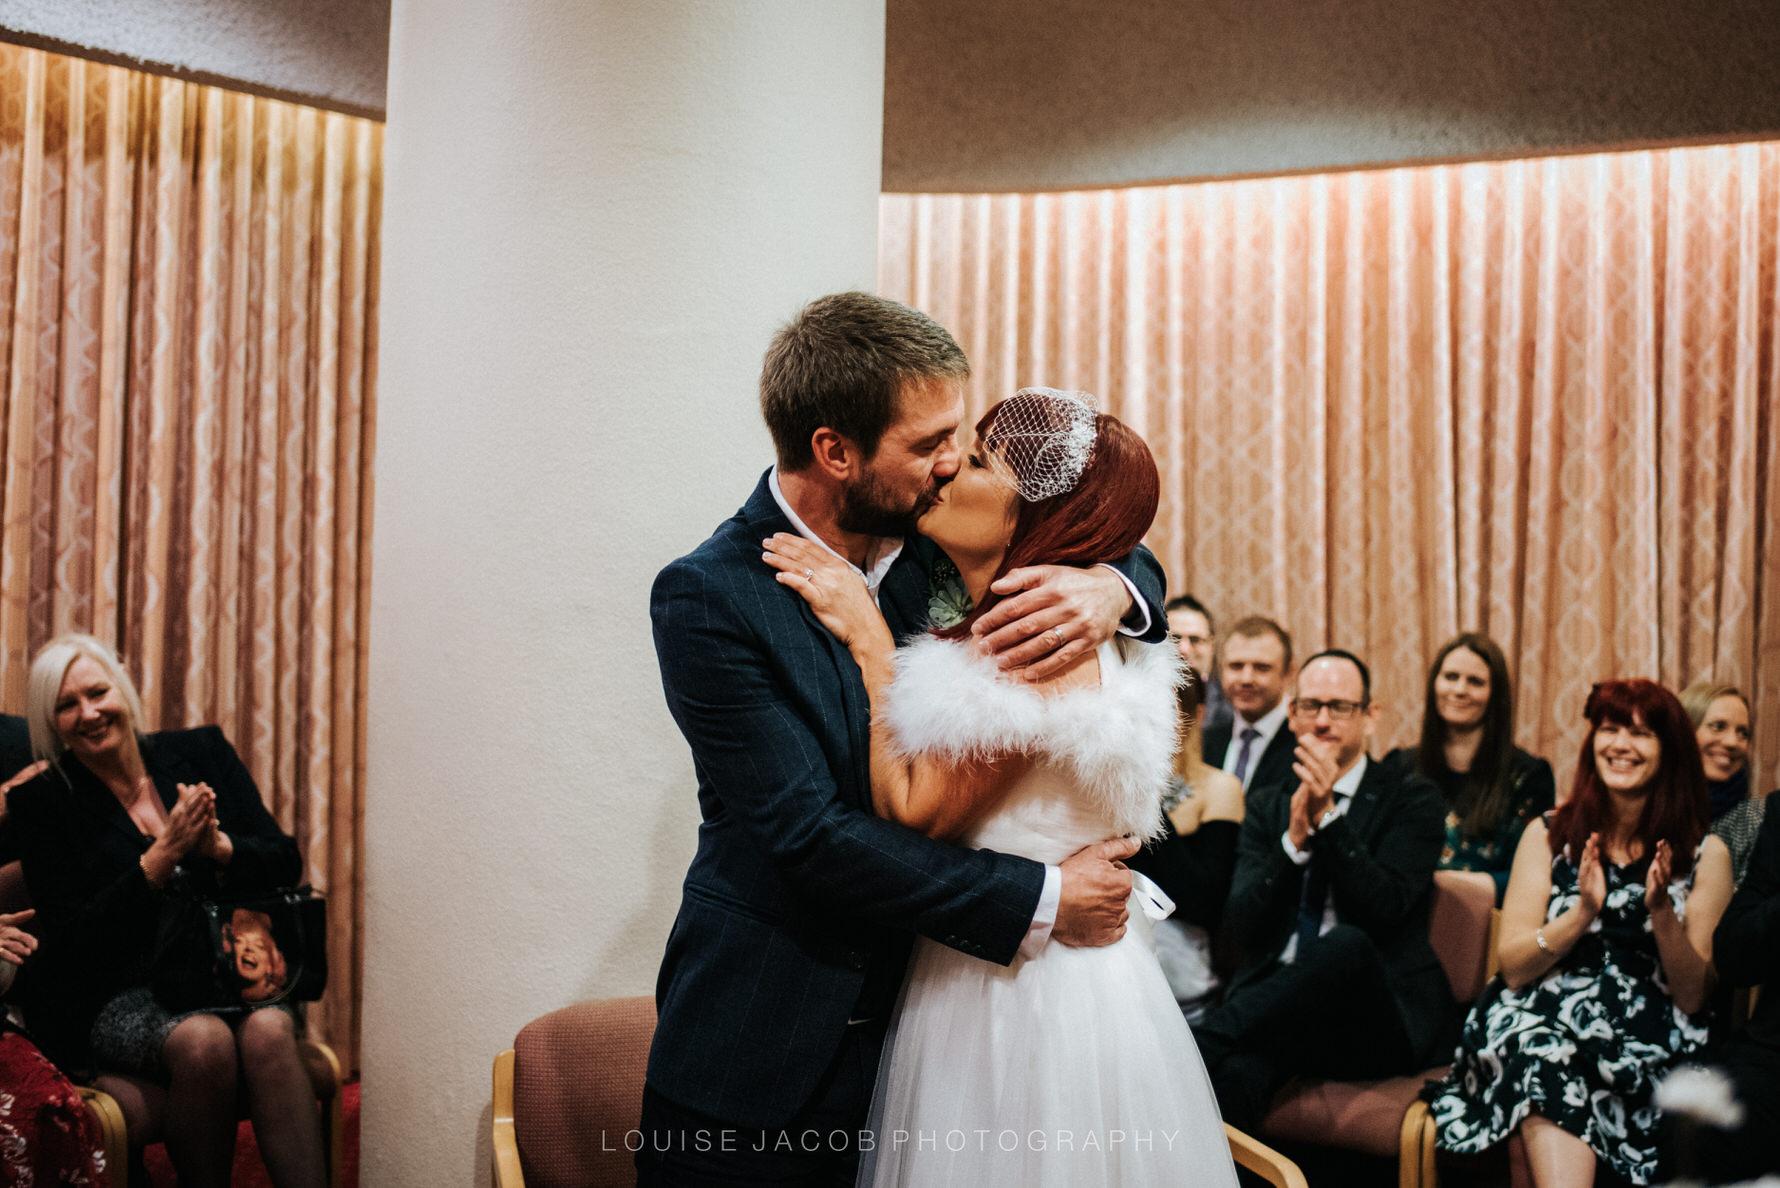 Documentary Wedding Photography first kiss